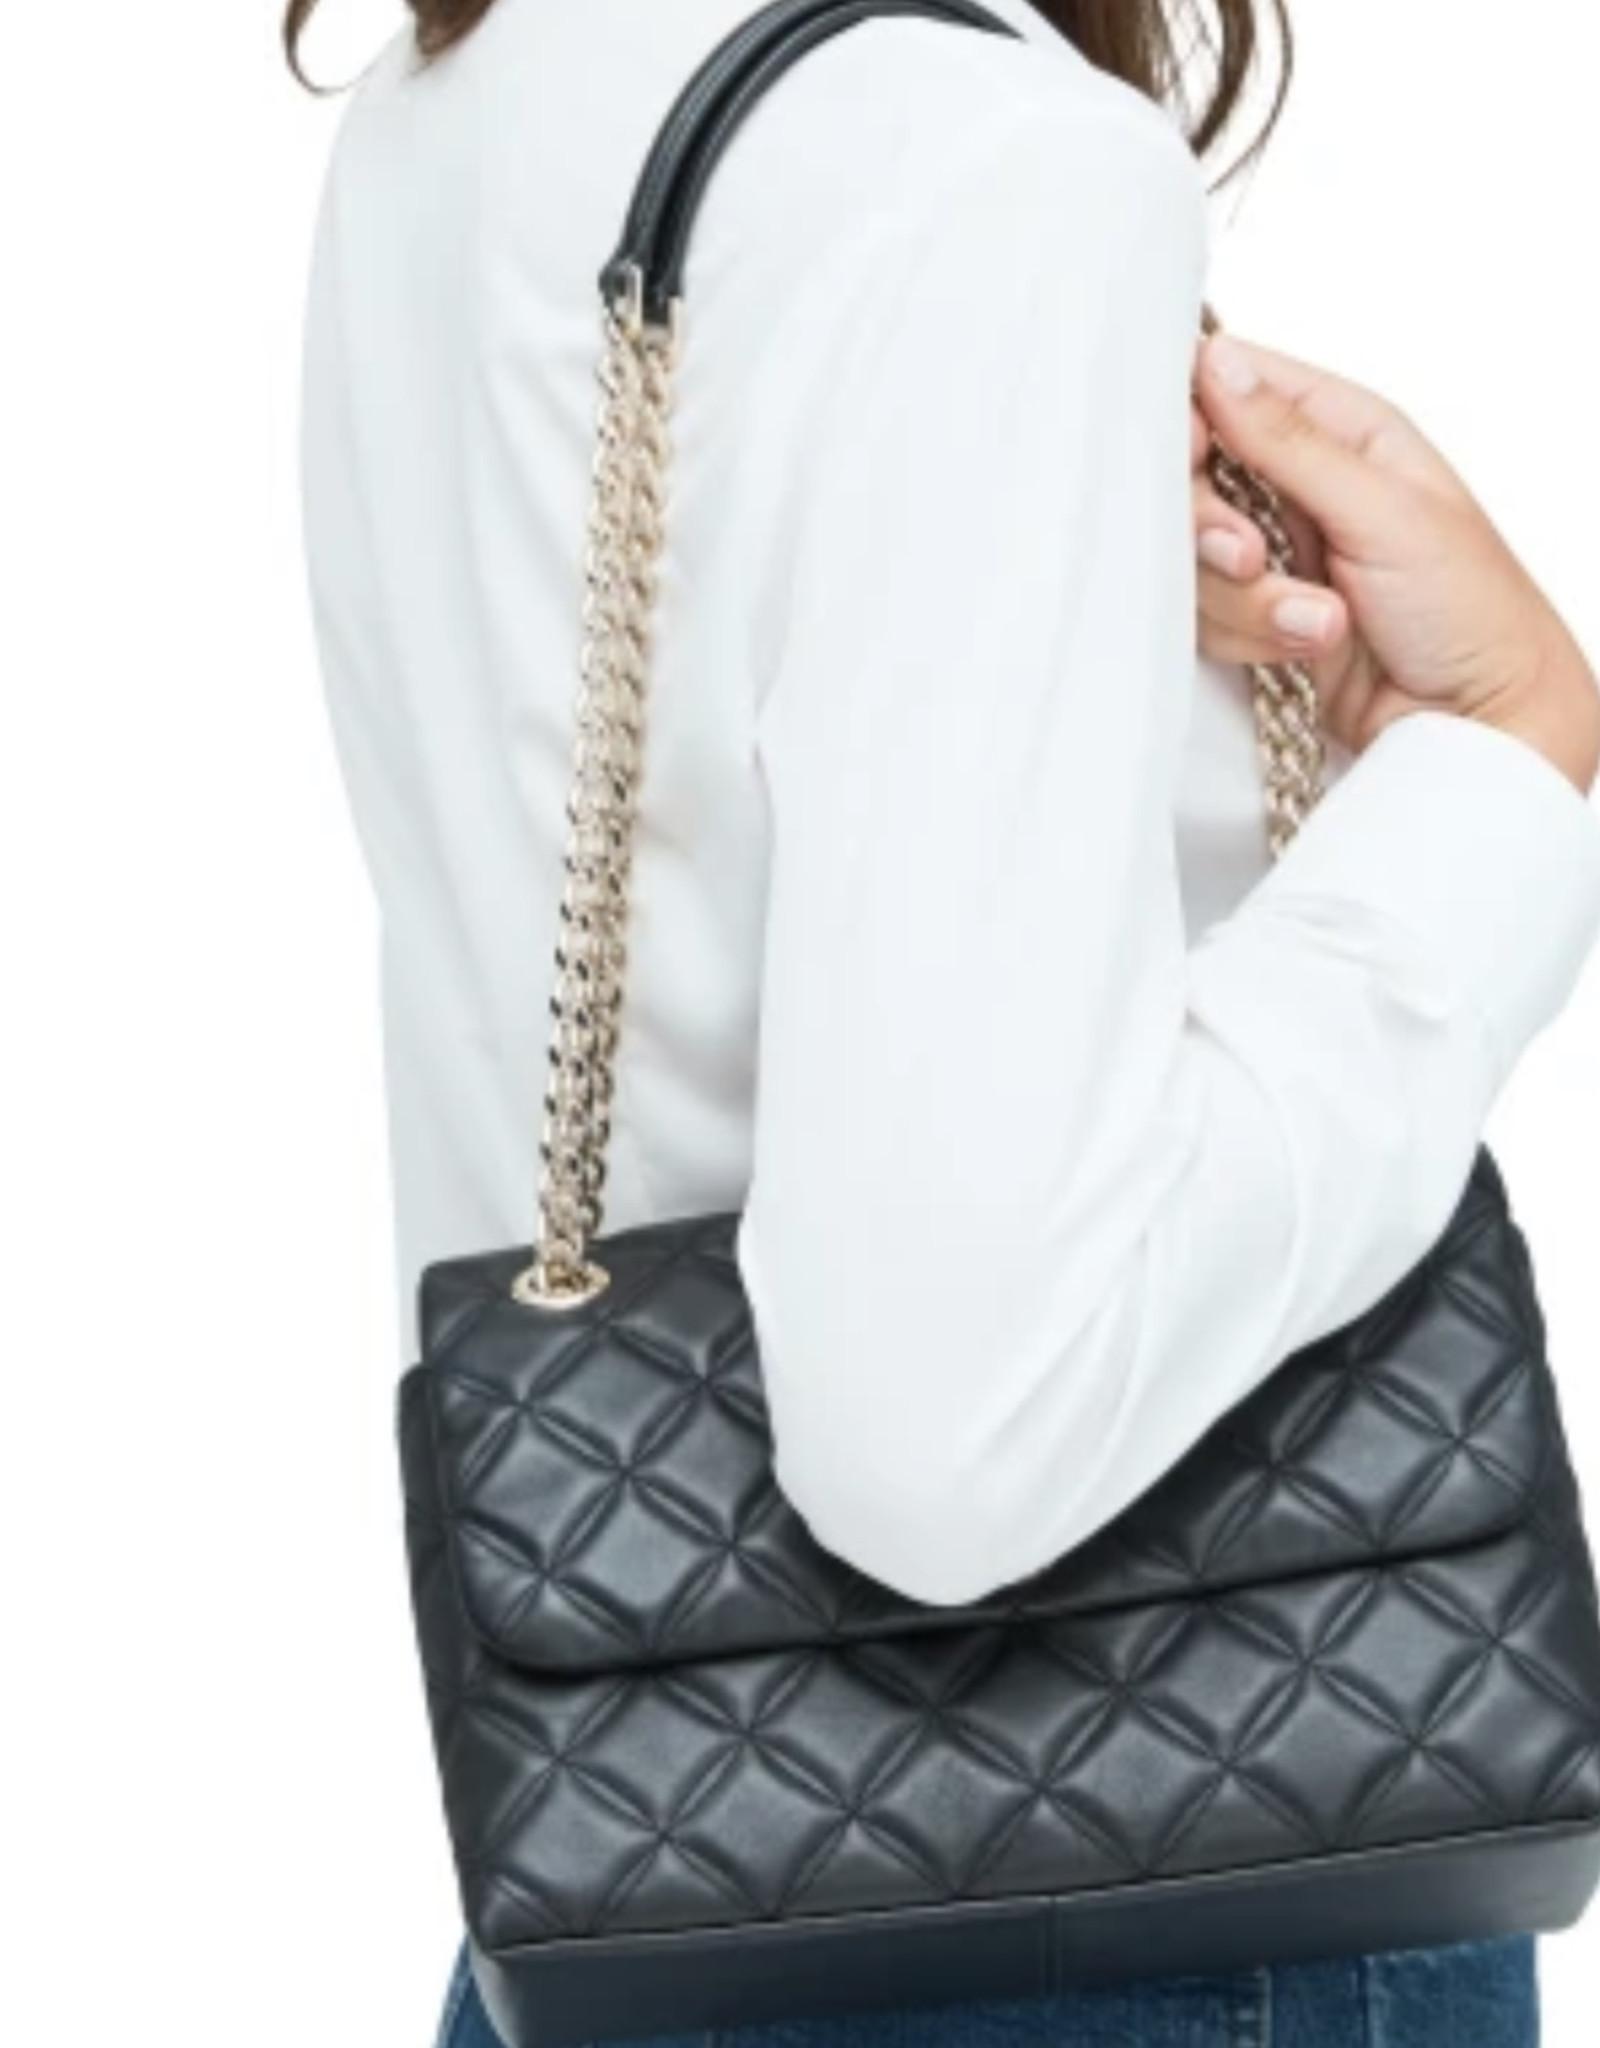 Kate Spade Kate Spade  Medium Flap Shoulder Bag Natalia